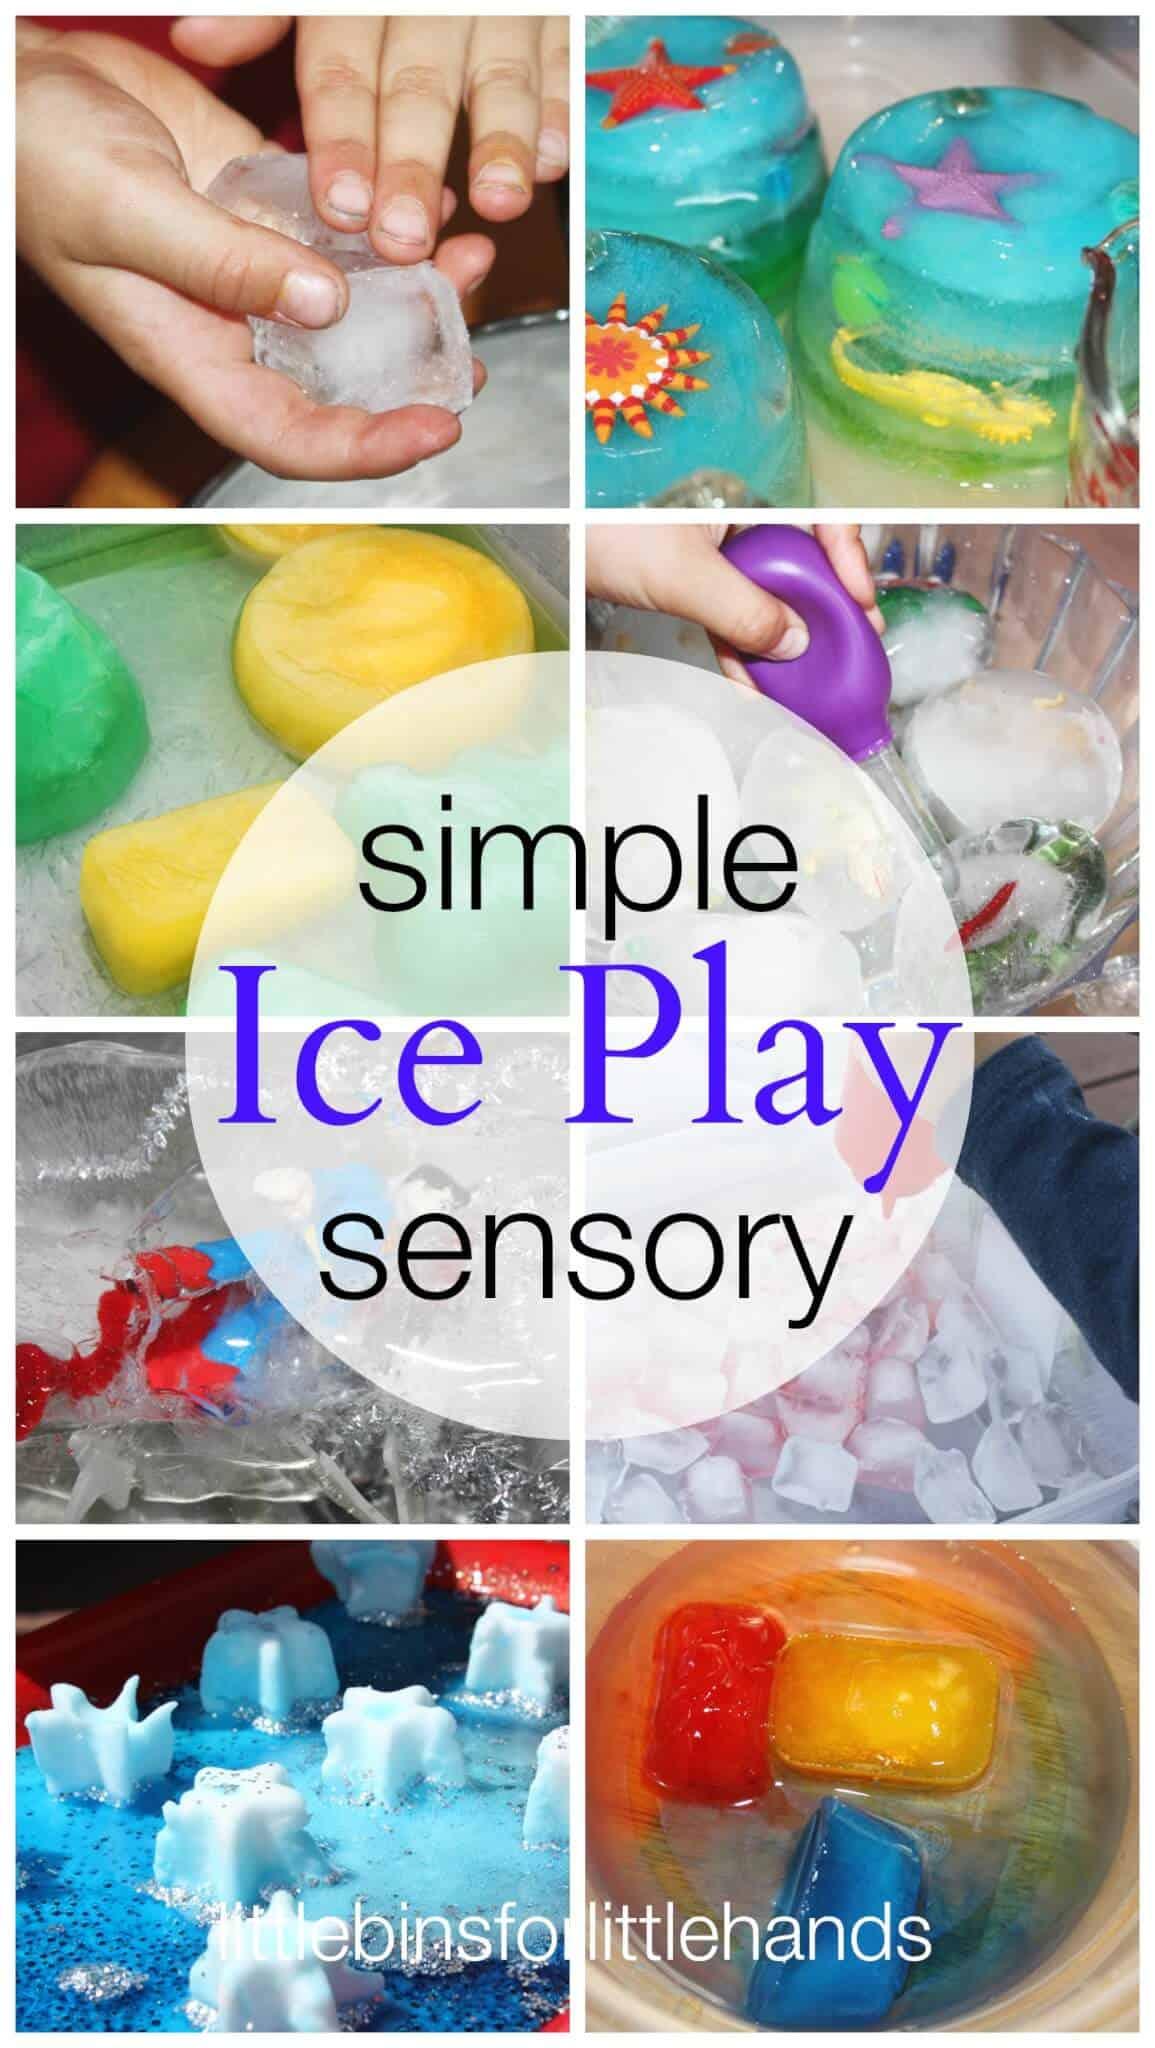 25 Playful Learning Preschool Activities | Little Bins for ...